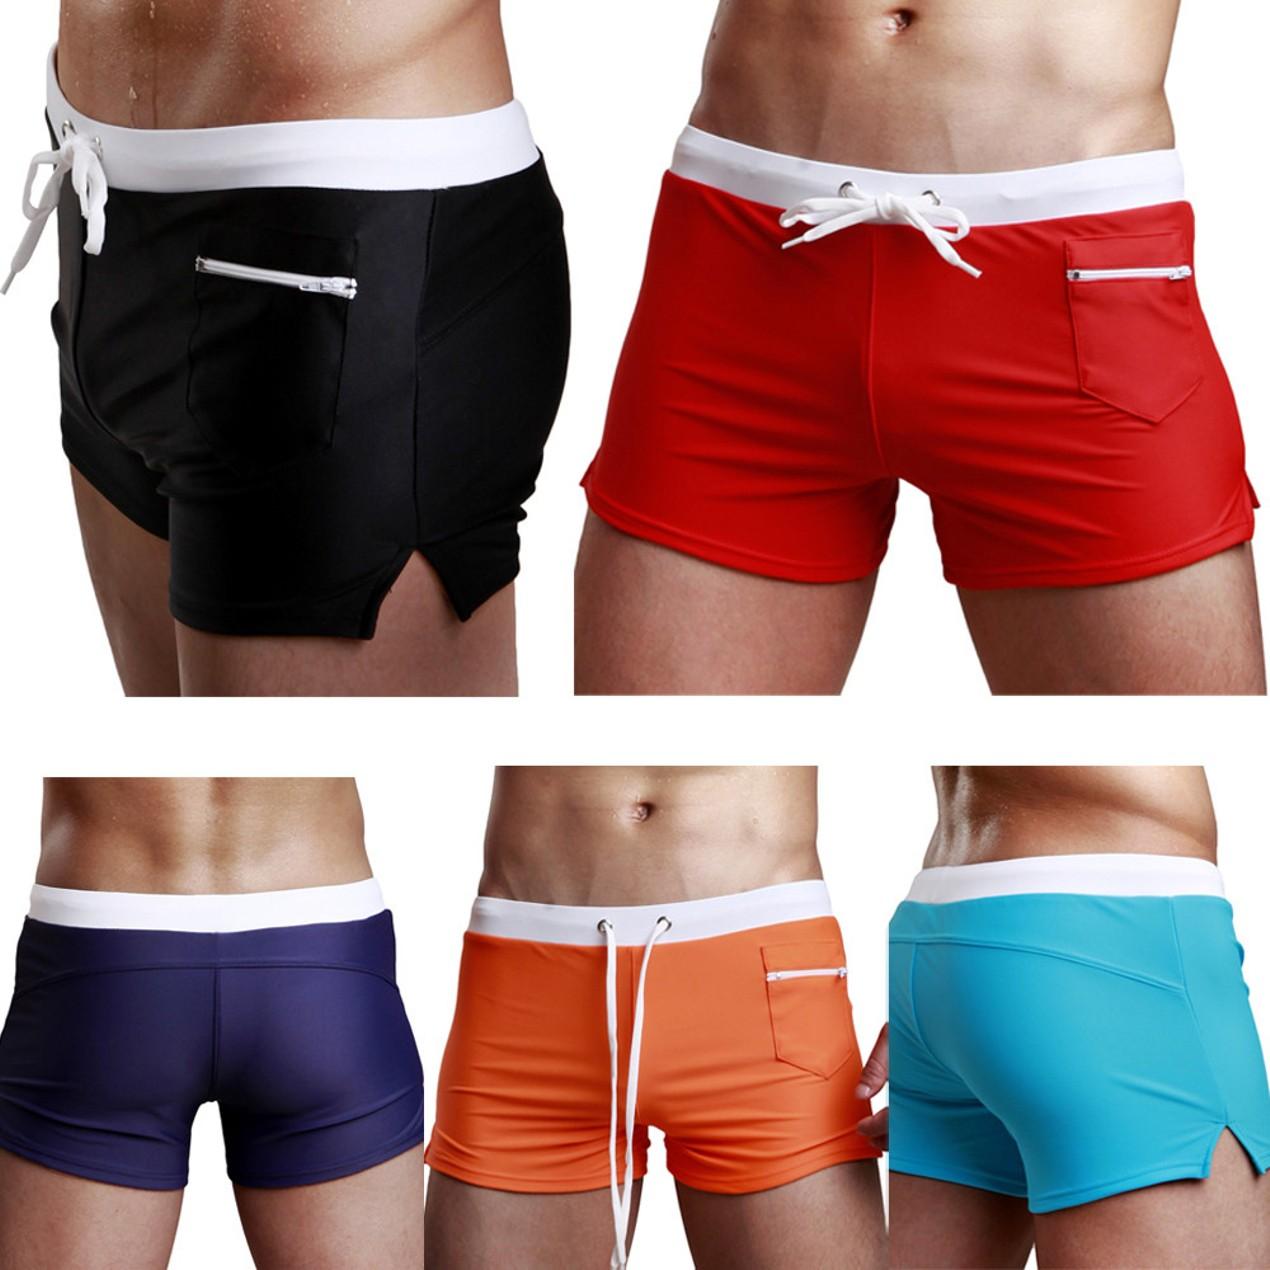 e14c668652 Swimsuit Fashion Swimming Trunks Briefs Beach Shorts Mens Underpant ...